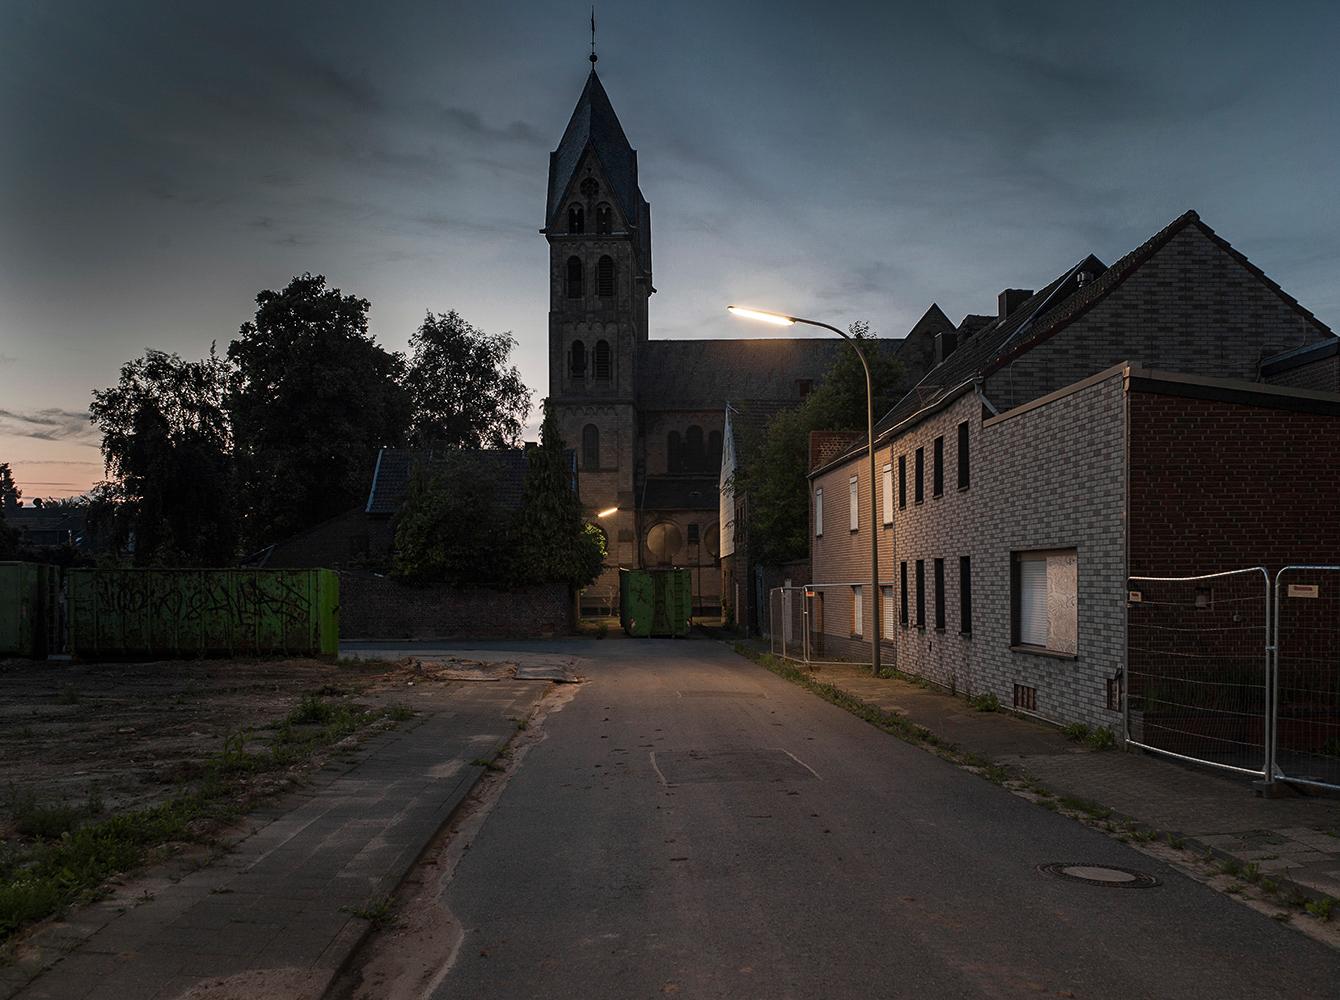 St. Lambertus Kirche, Immerath